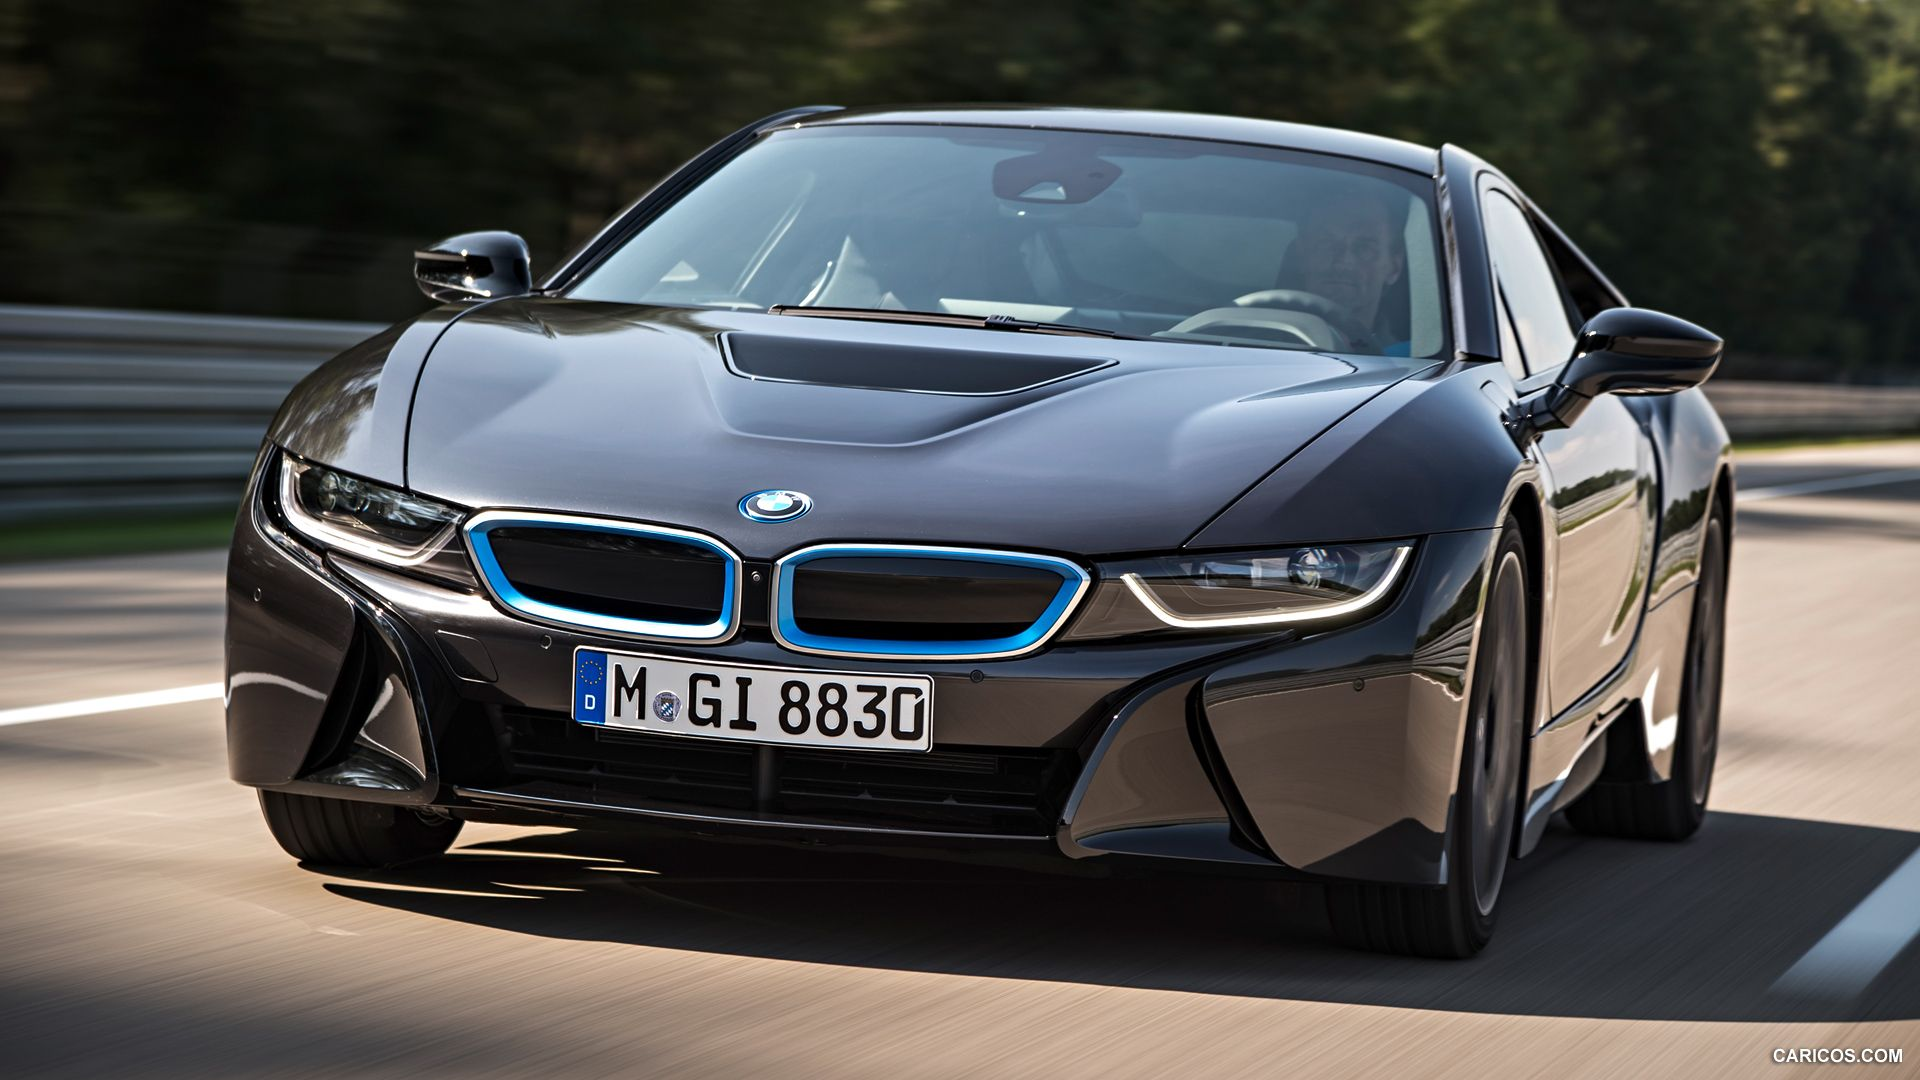 Bmw Căutare Google Cars Pinterest BMW Bmw I And Cars - Bmw 2015 cars